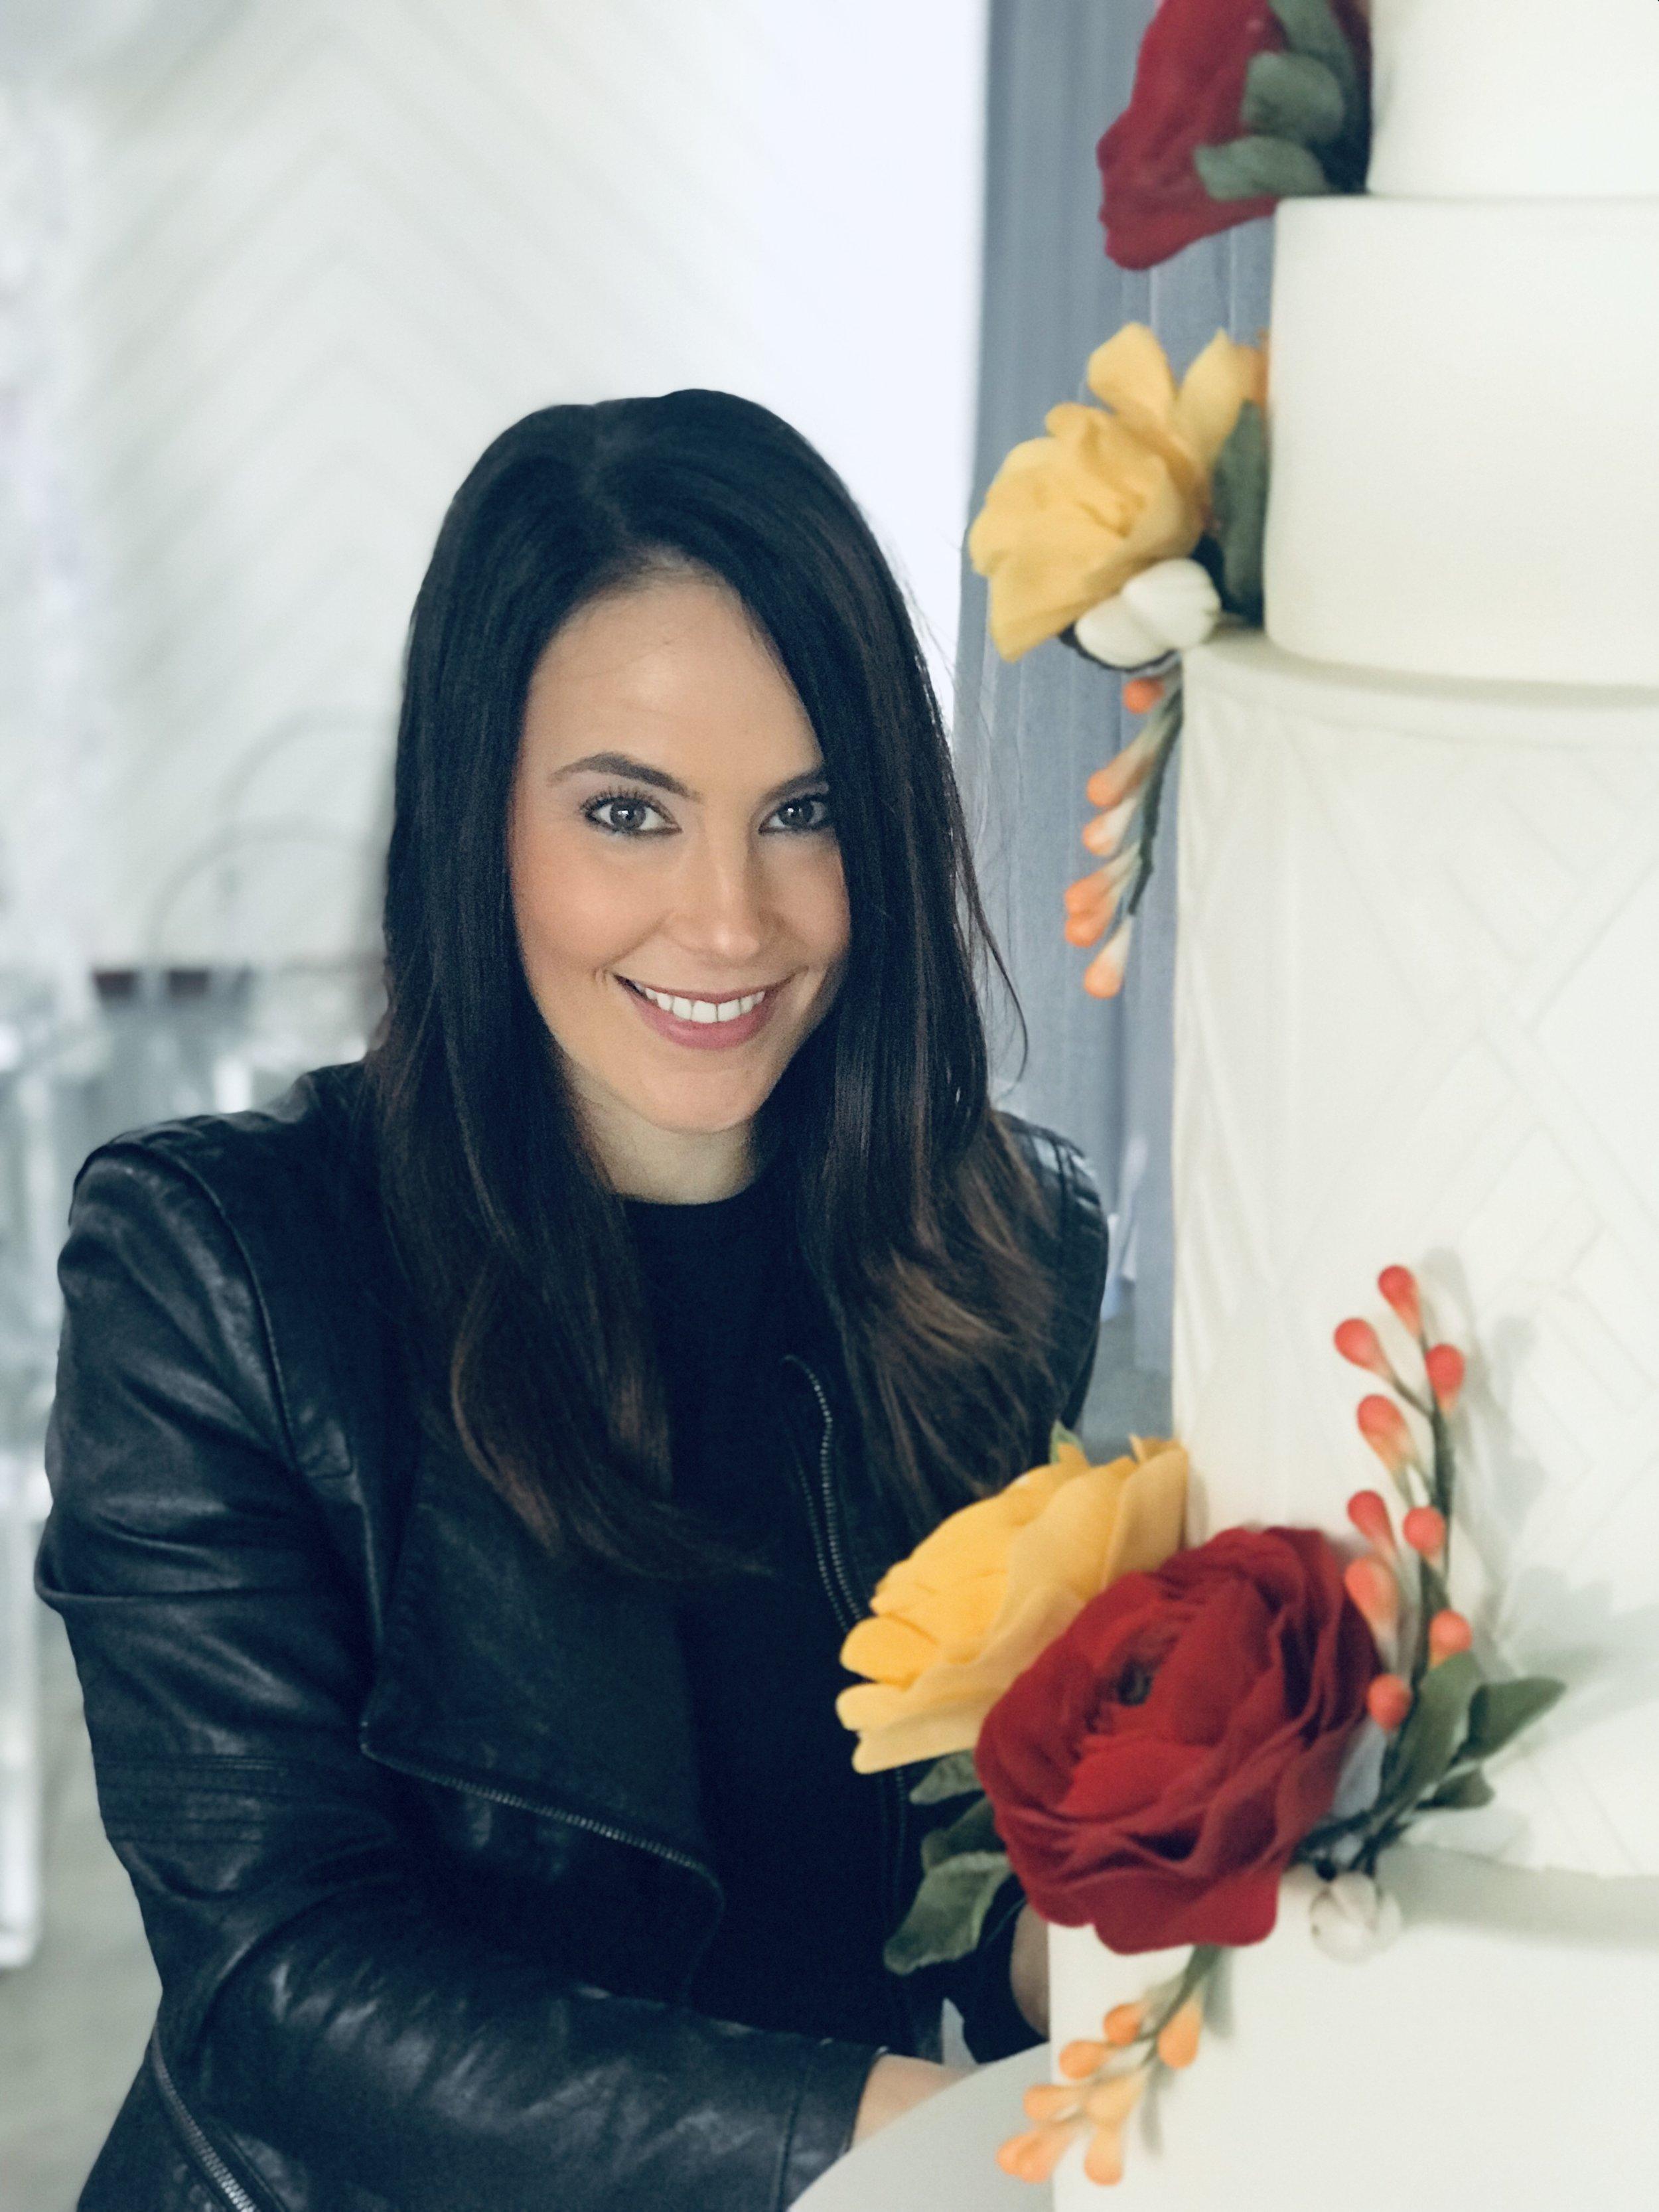 Michelle - Owner & Creative Director